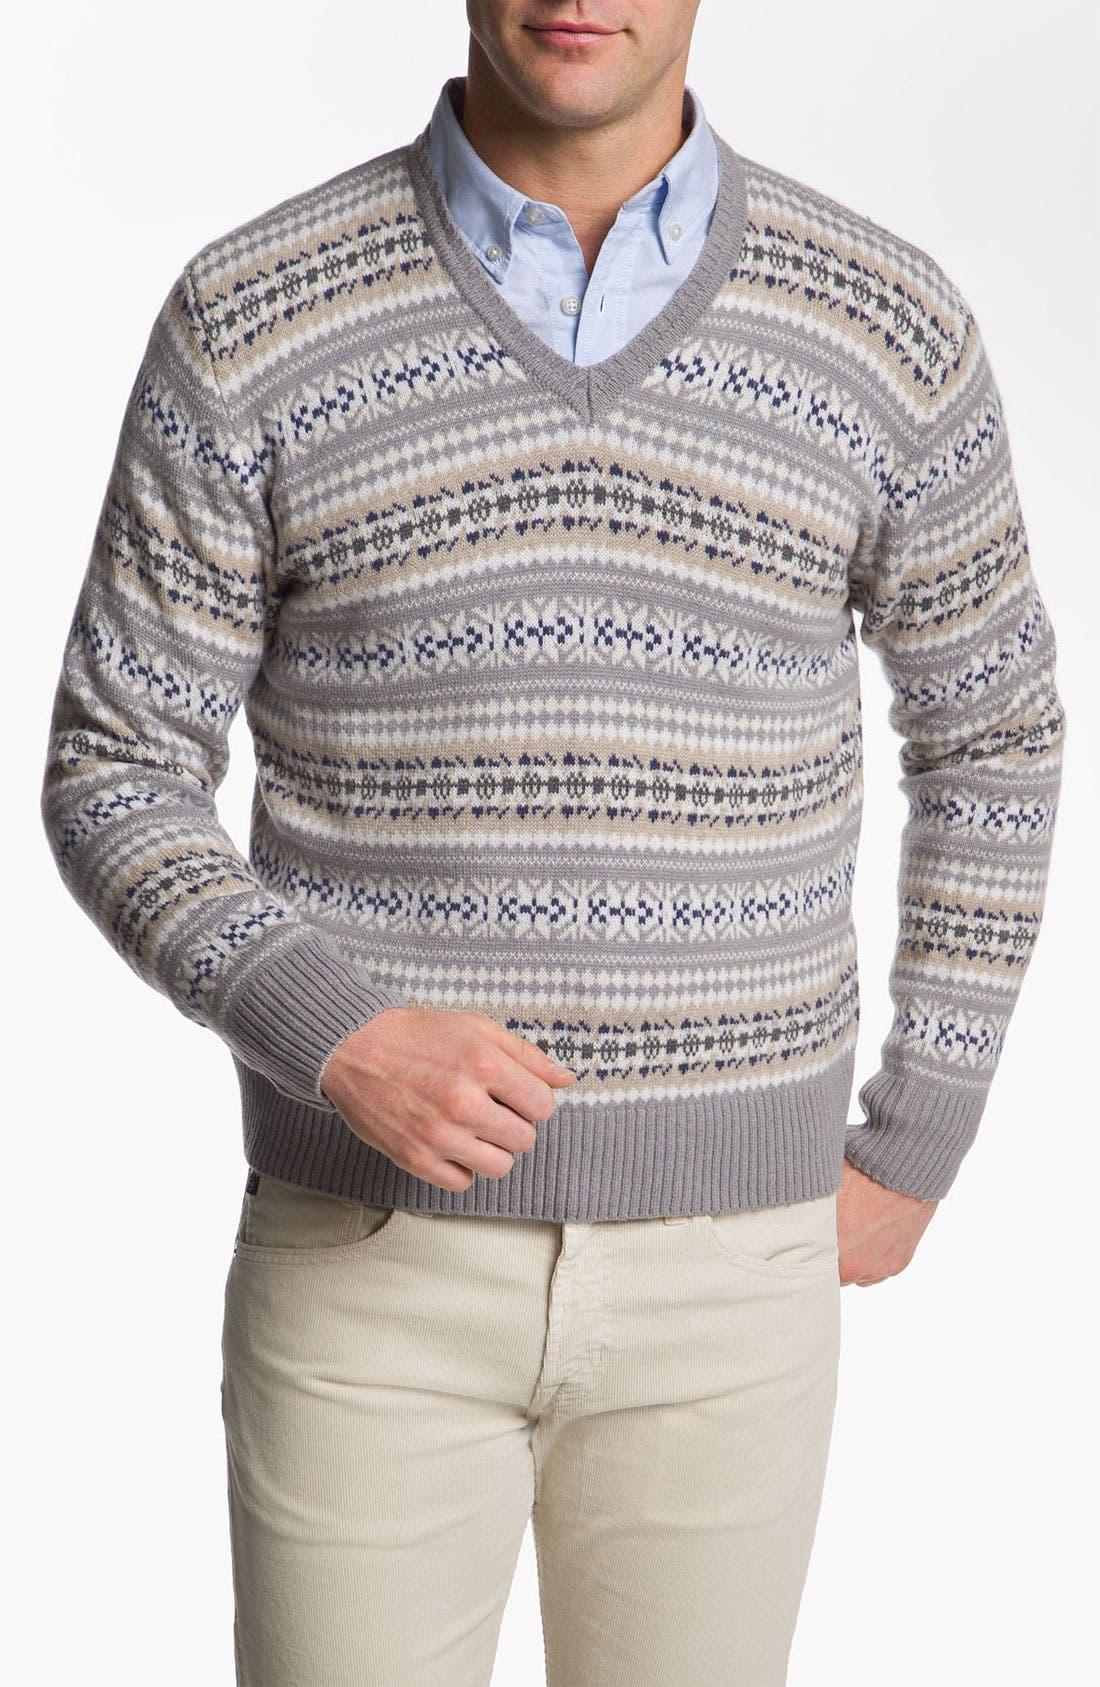 Alternate Image 1 Selected - Fausto Reali Vannucci V-Neck Merino Wool & Cashmere Sweater